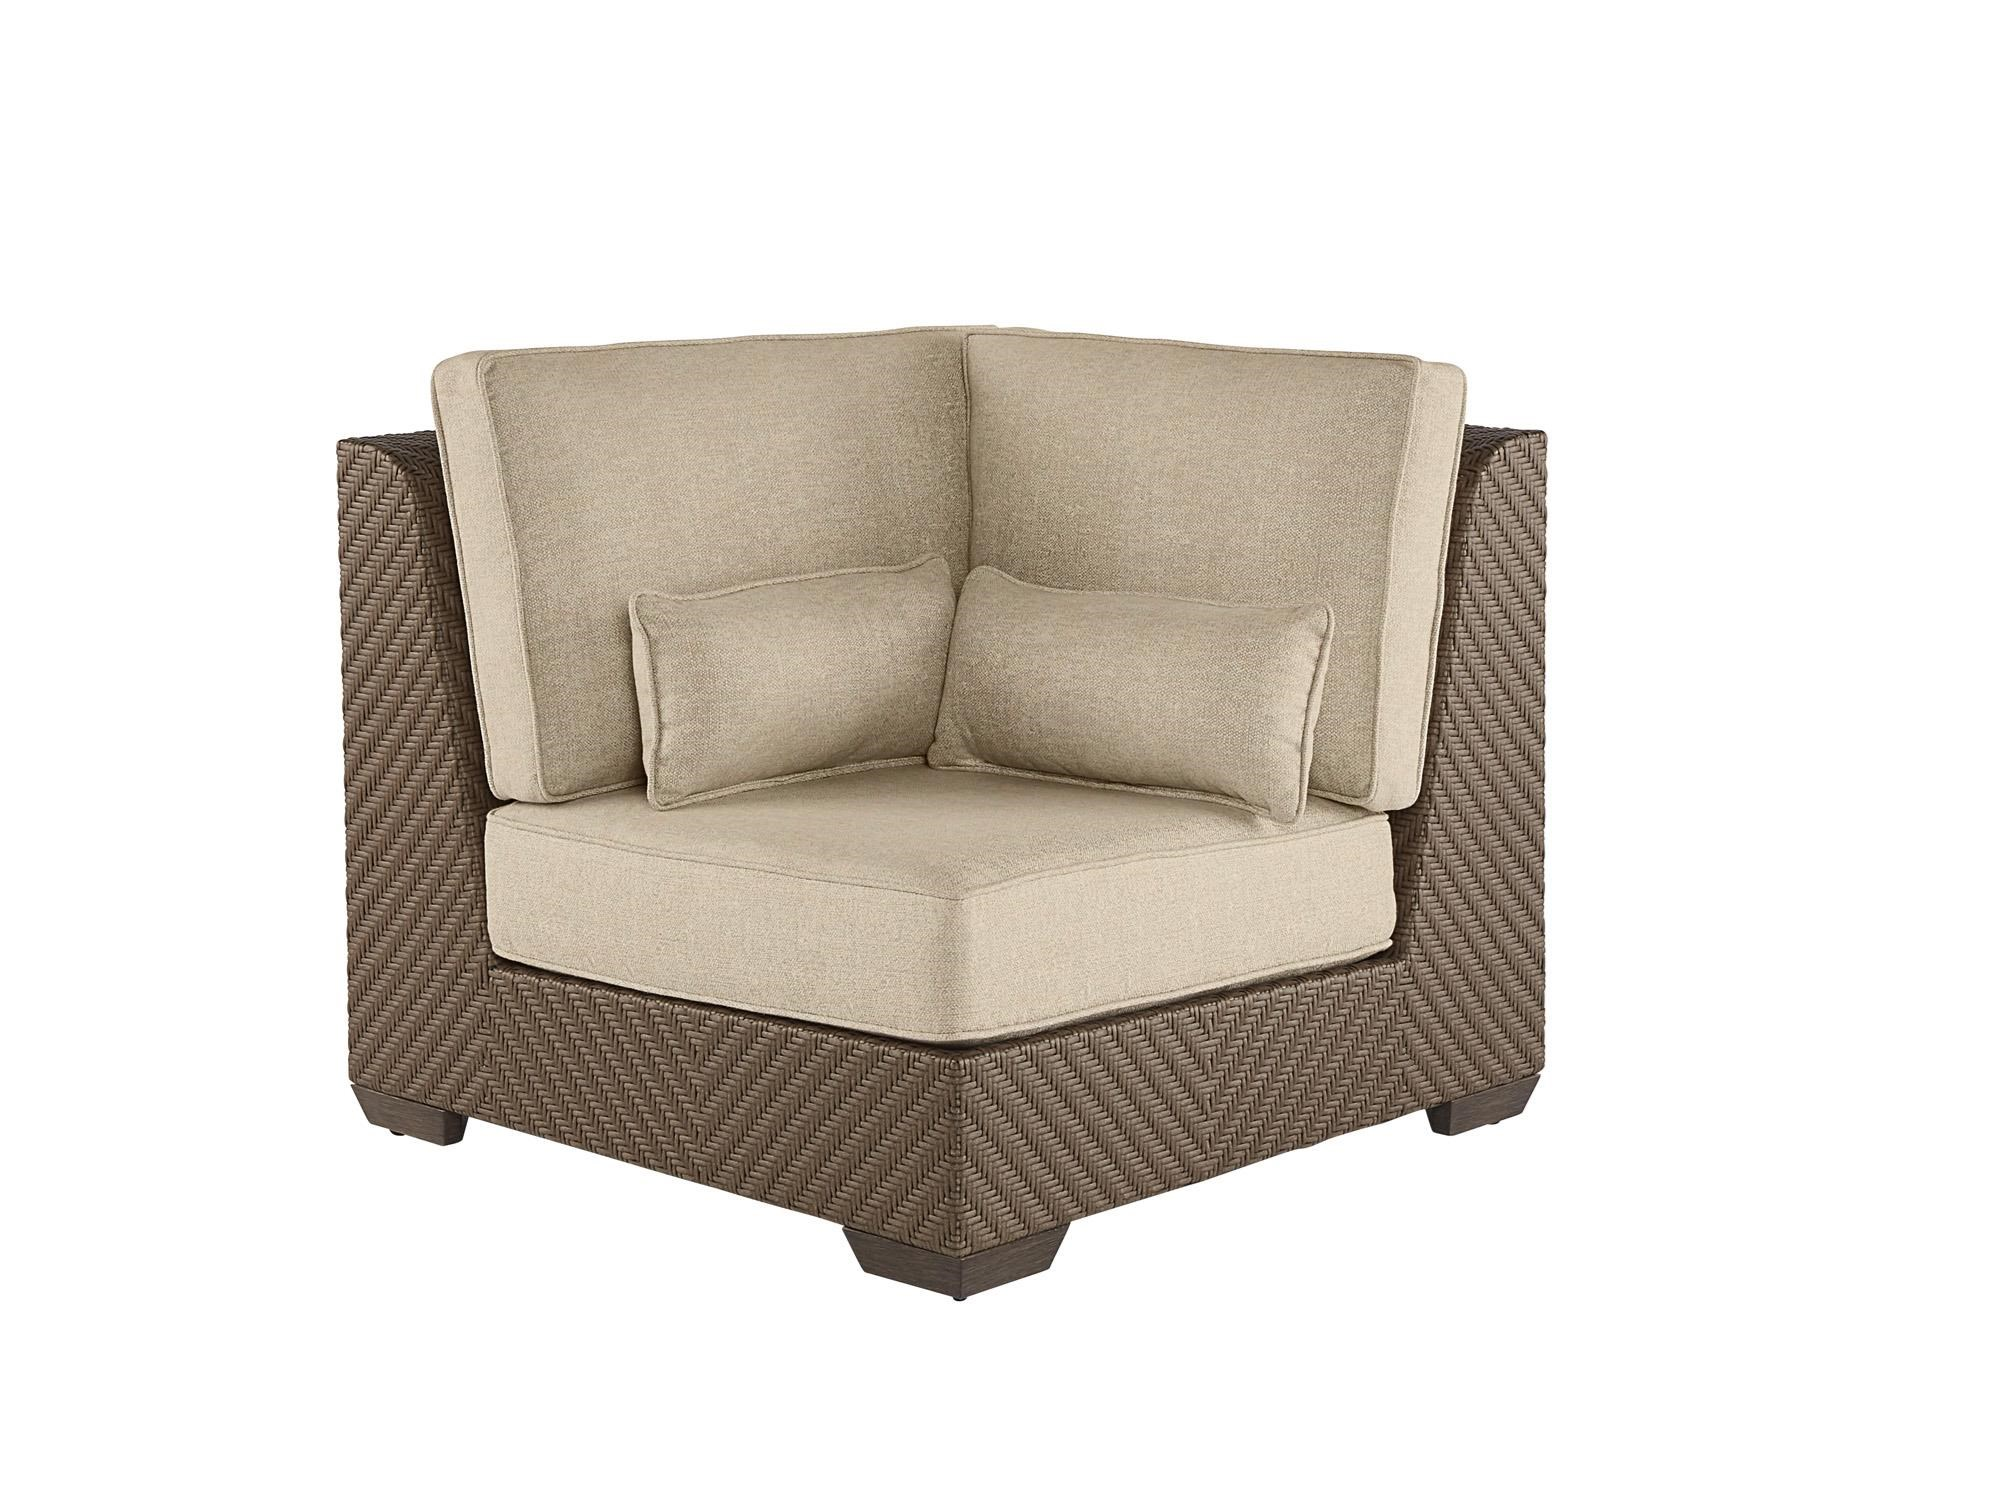 A.R.T. Furniture Inc 933-Arch Salvage Corner - Item Number: 933513-4124